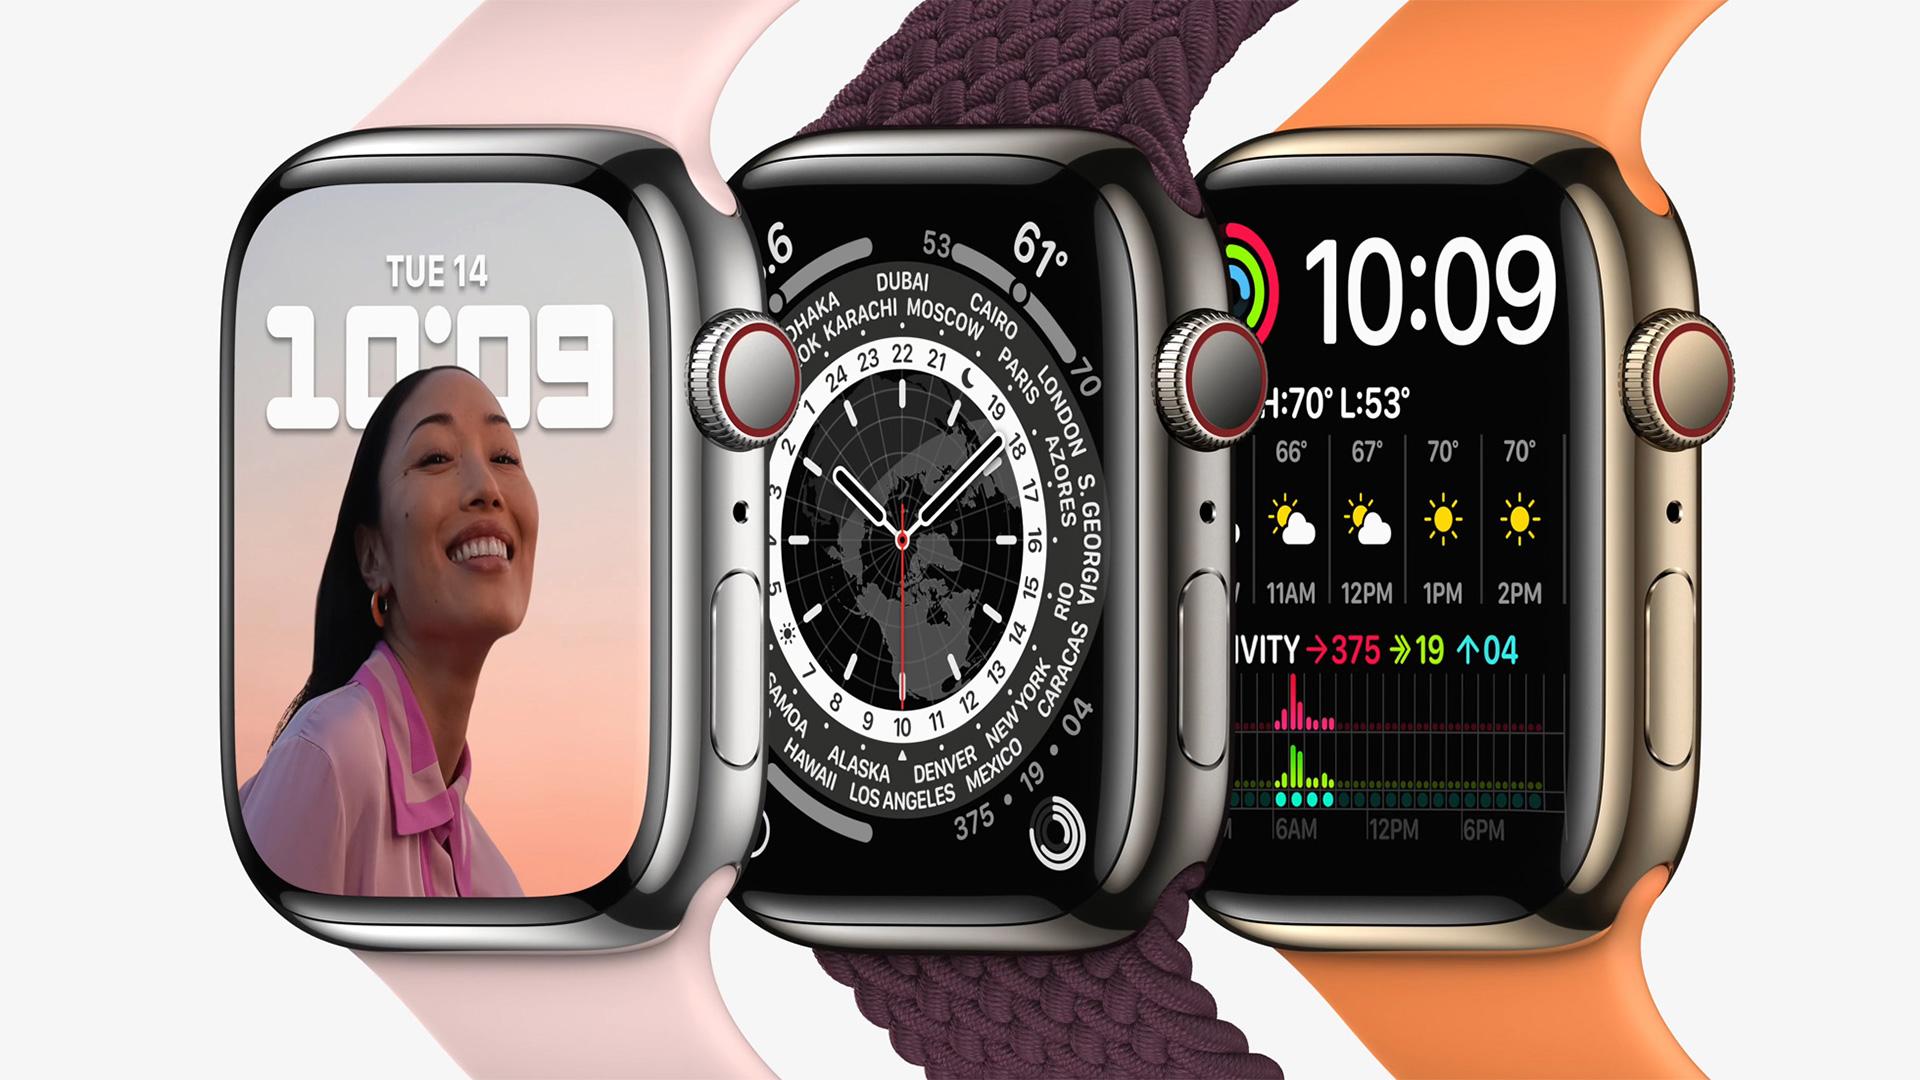 Apple Watch Series 7 in steel